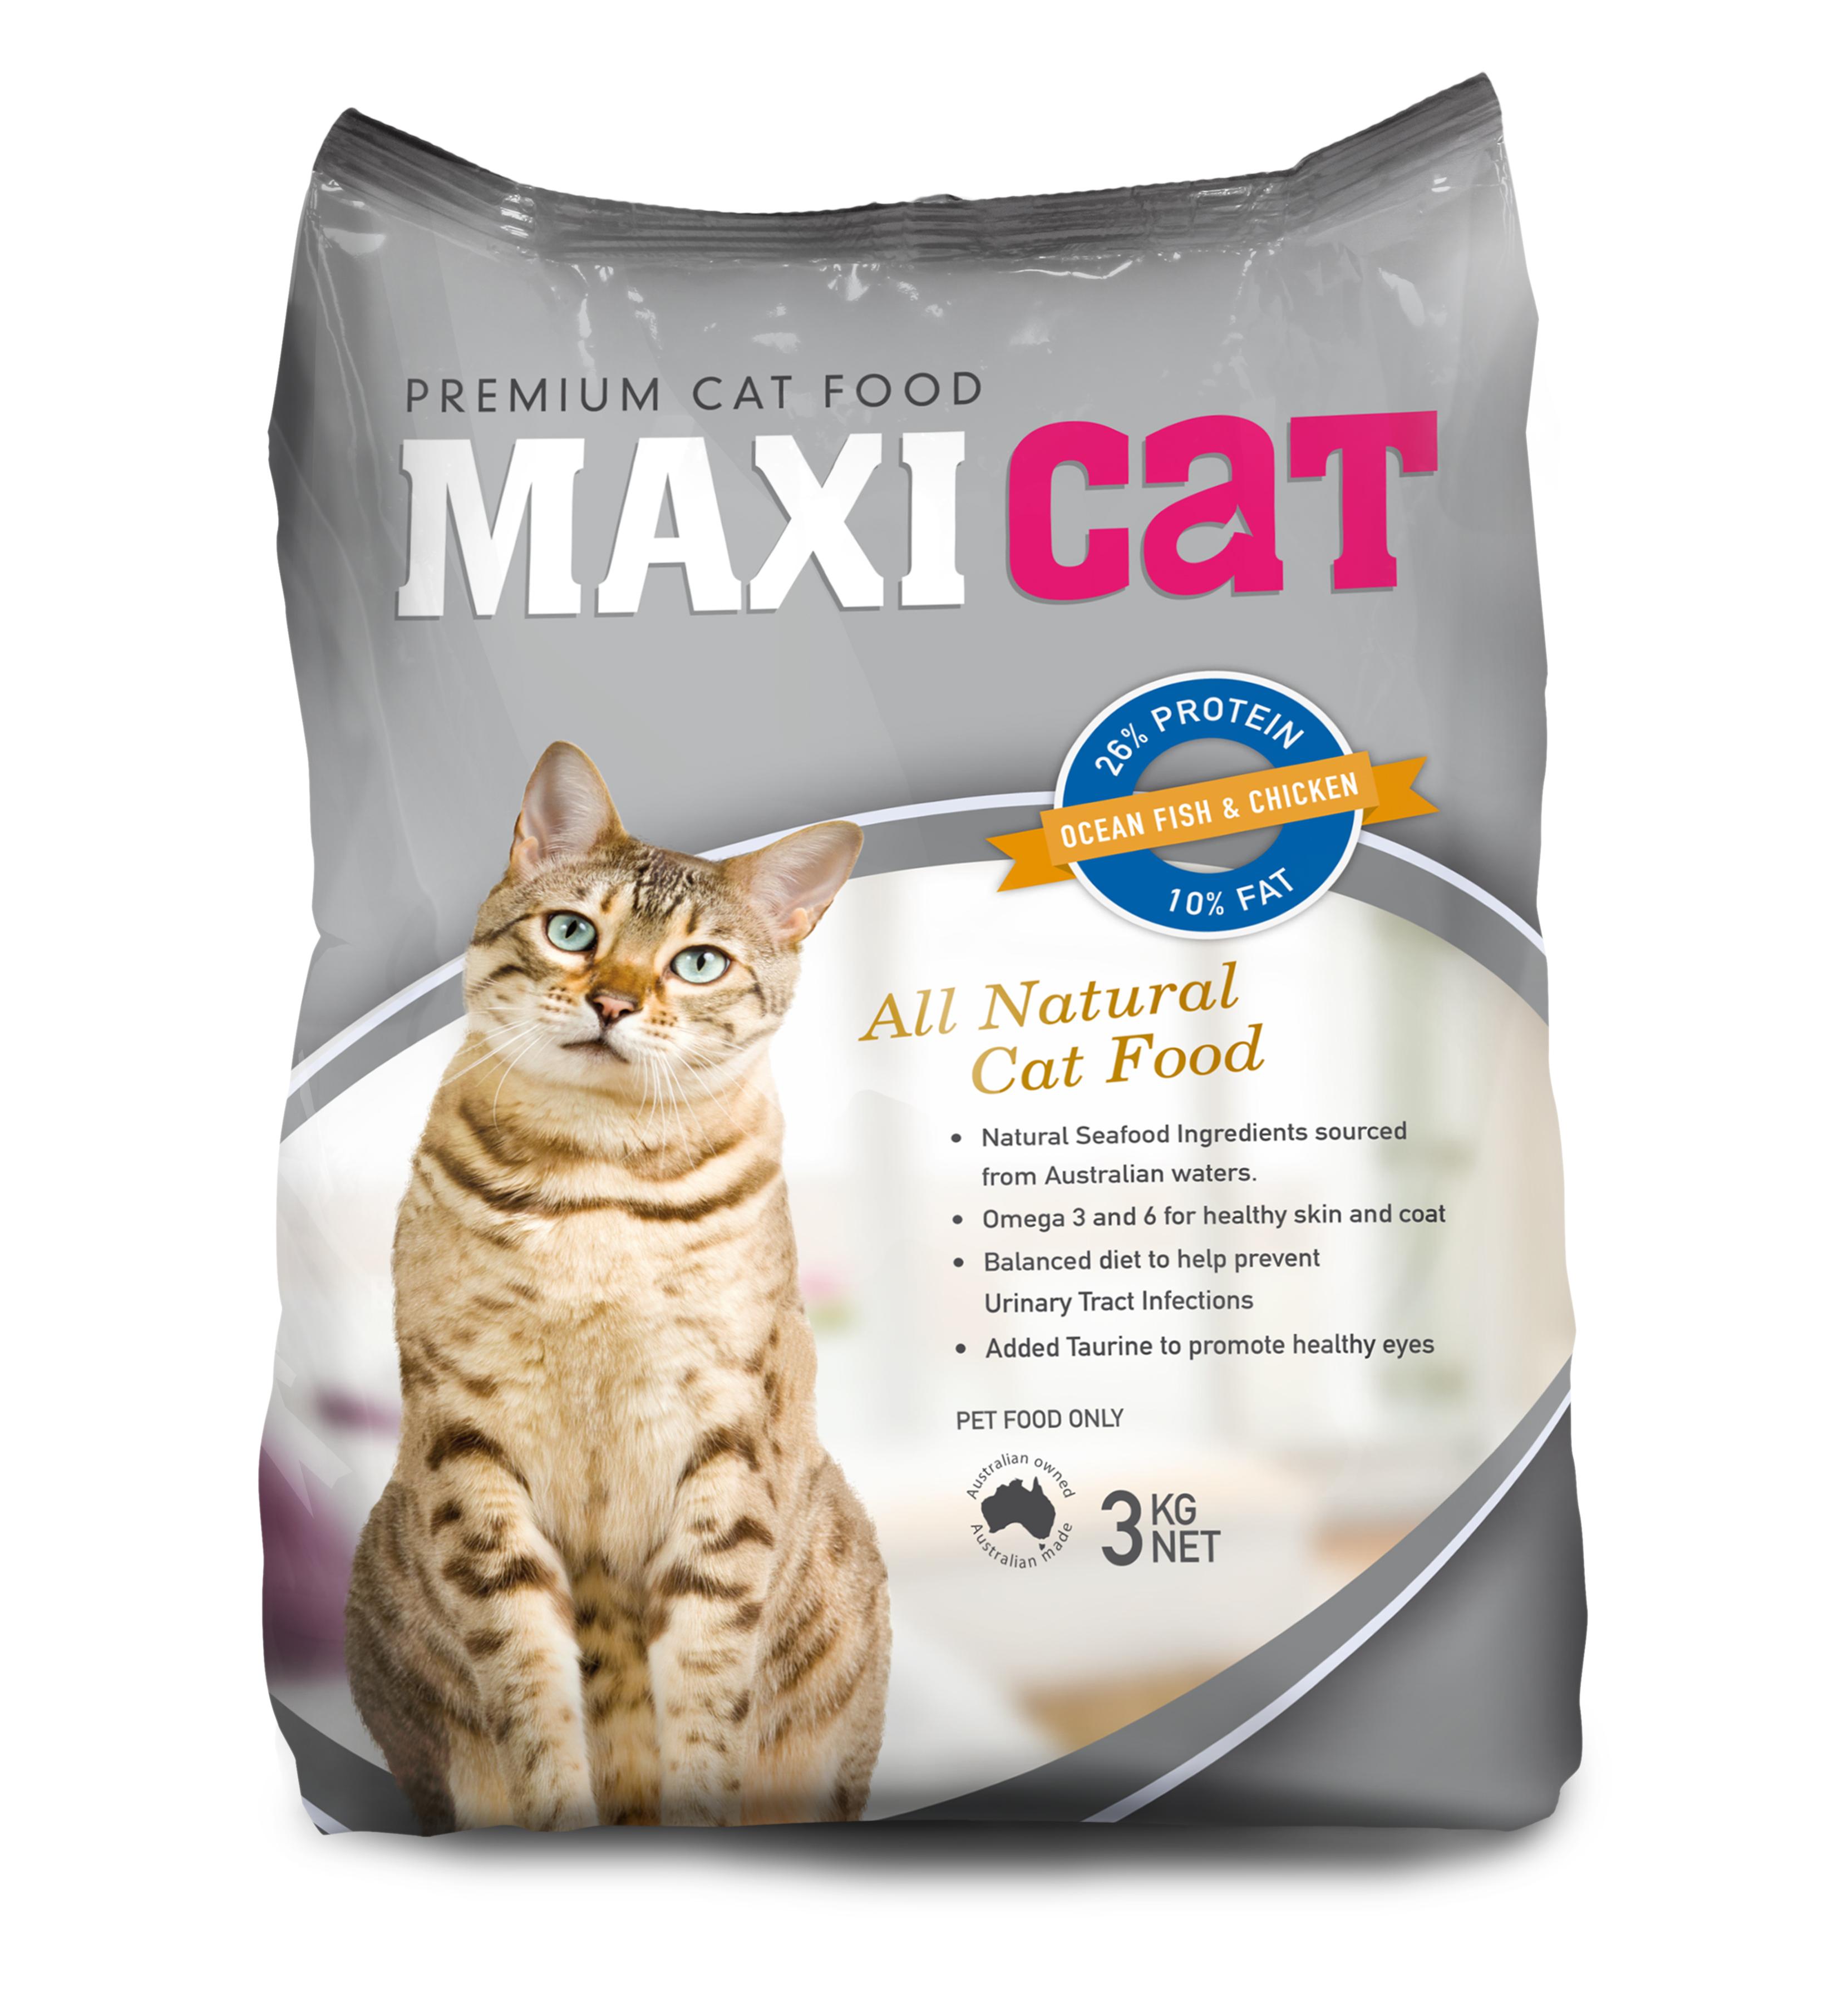 Maxi cat packaging